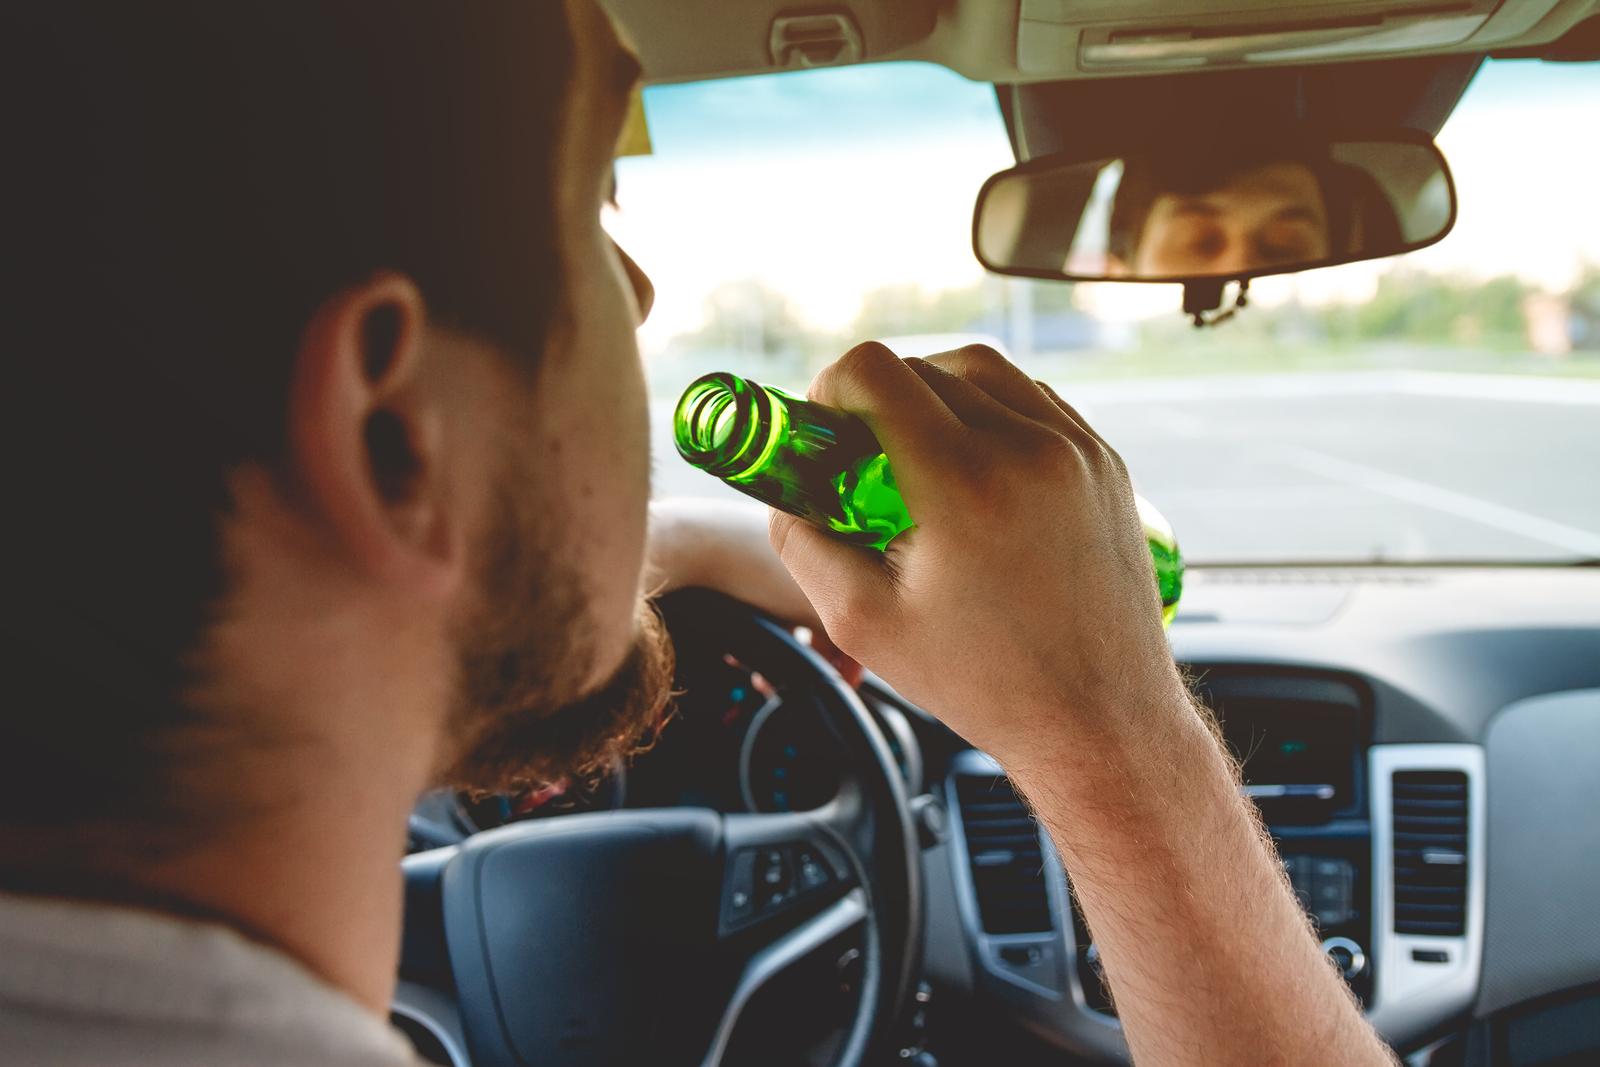 Jazda pod wpływem alkoholu – możliwe konsekwencje